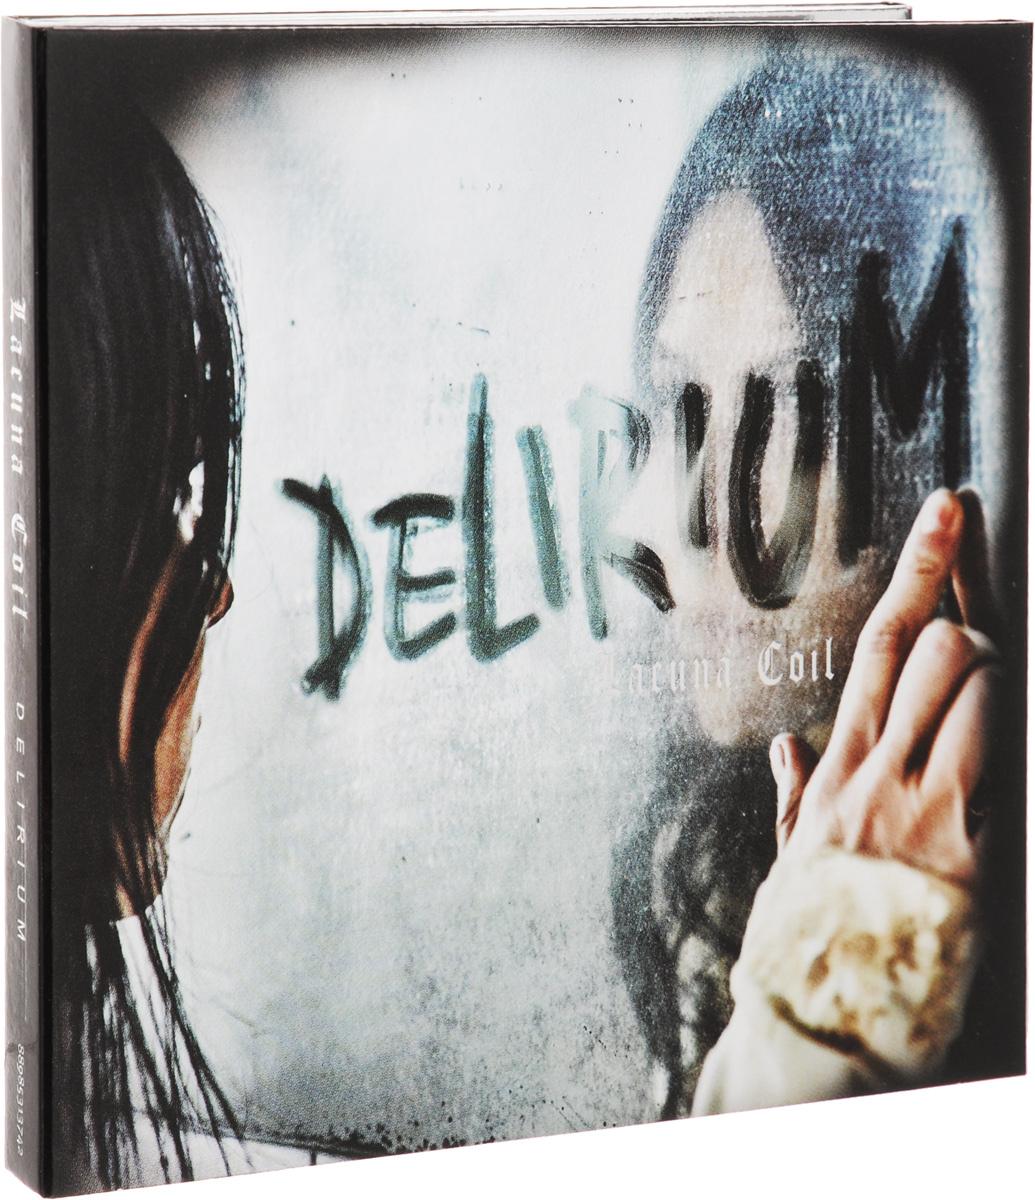 Lacuna Coil Lacuna Coil. Delirium. Limited Edition лайтбокс айвазовский девятый вал 25x25 130